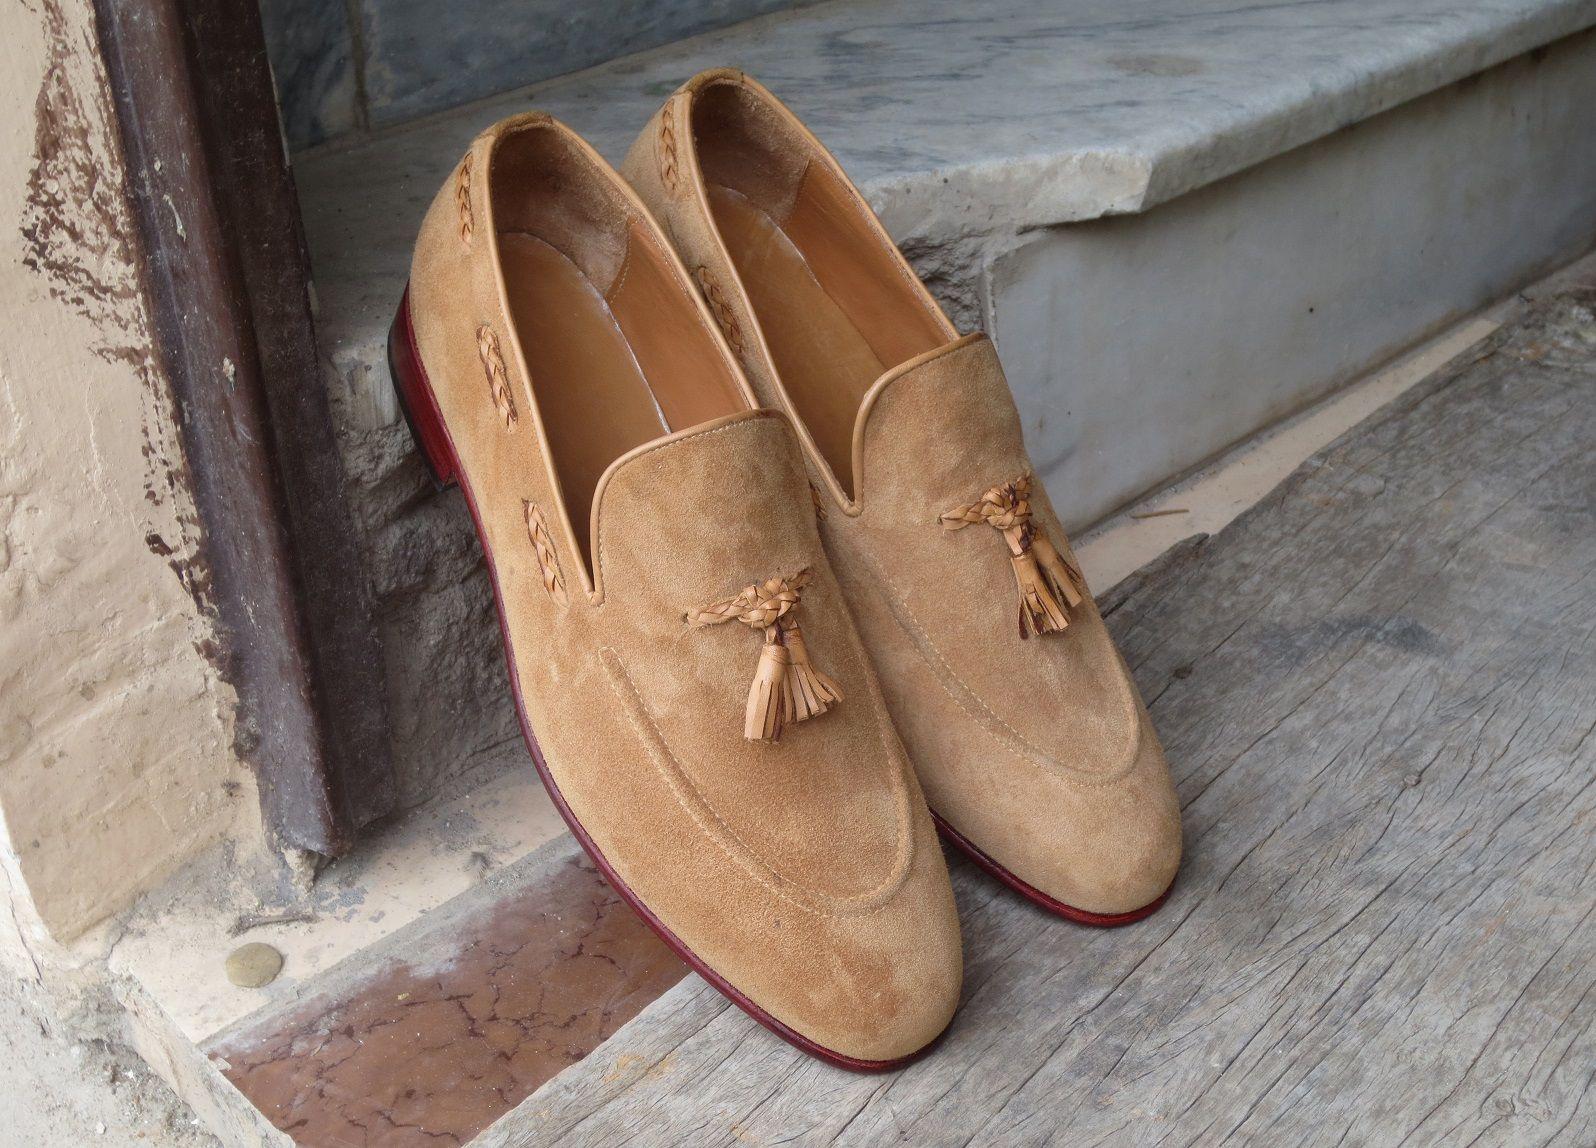 Handmade Beige Color Suede Loafer Slipper Dress Men S Fashion Moccasin Tussles Shoes In 2020 Dress Shoes Men Men Dress Loafers